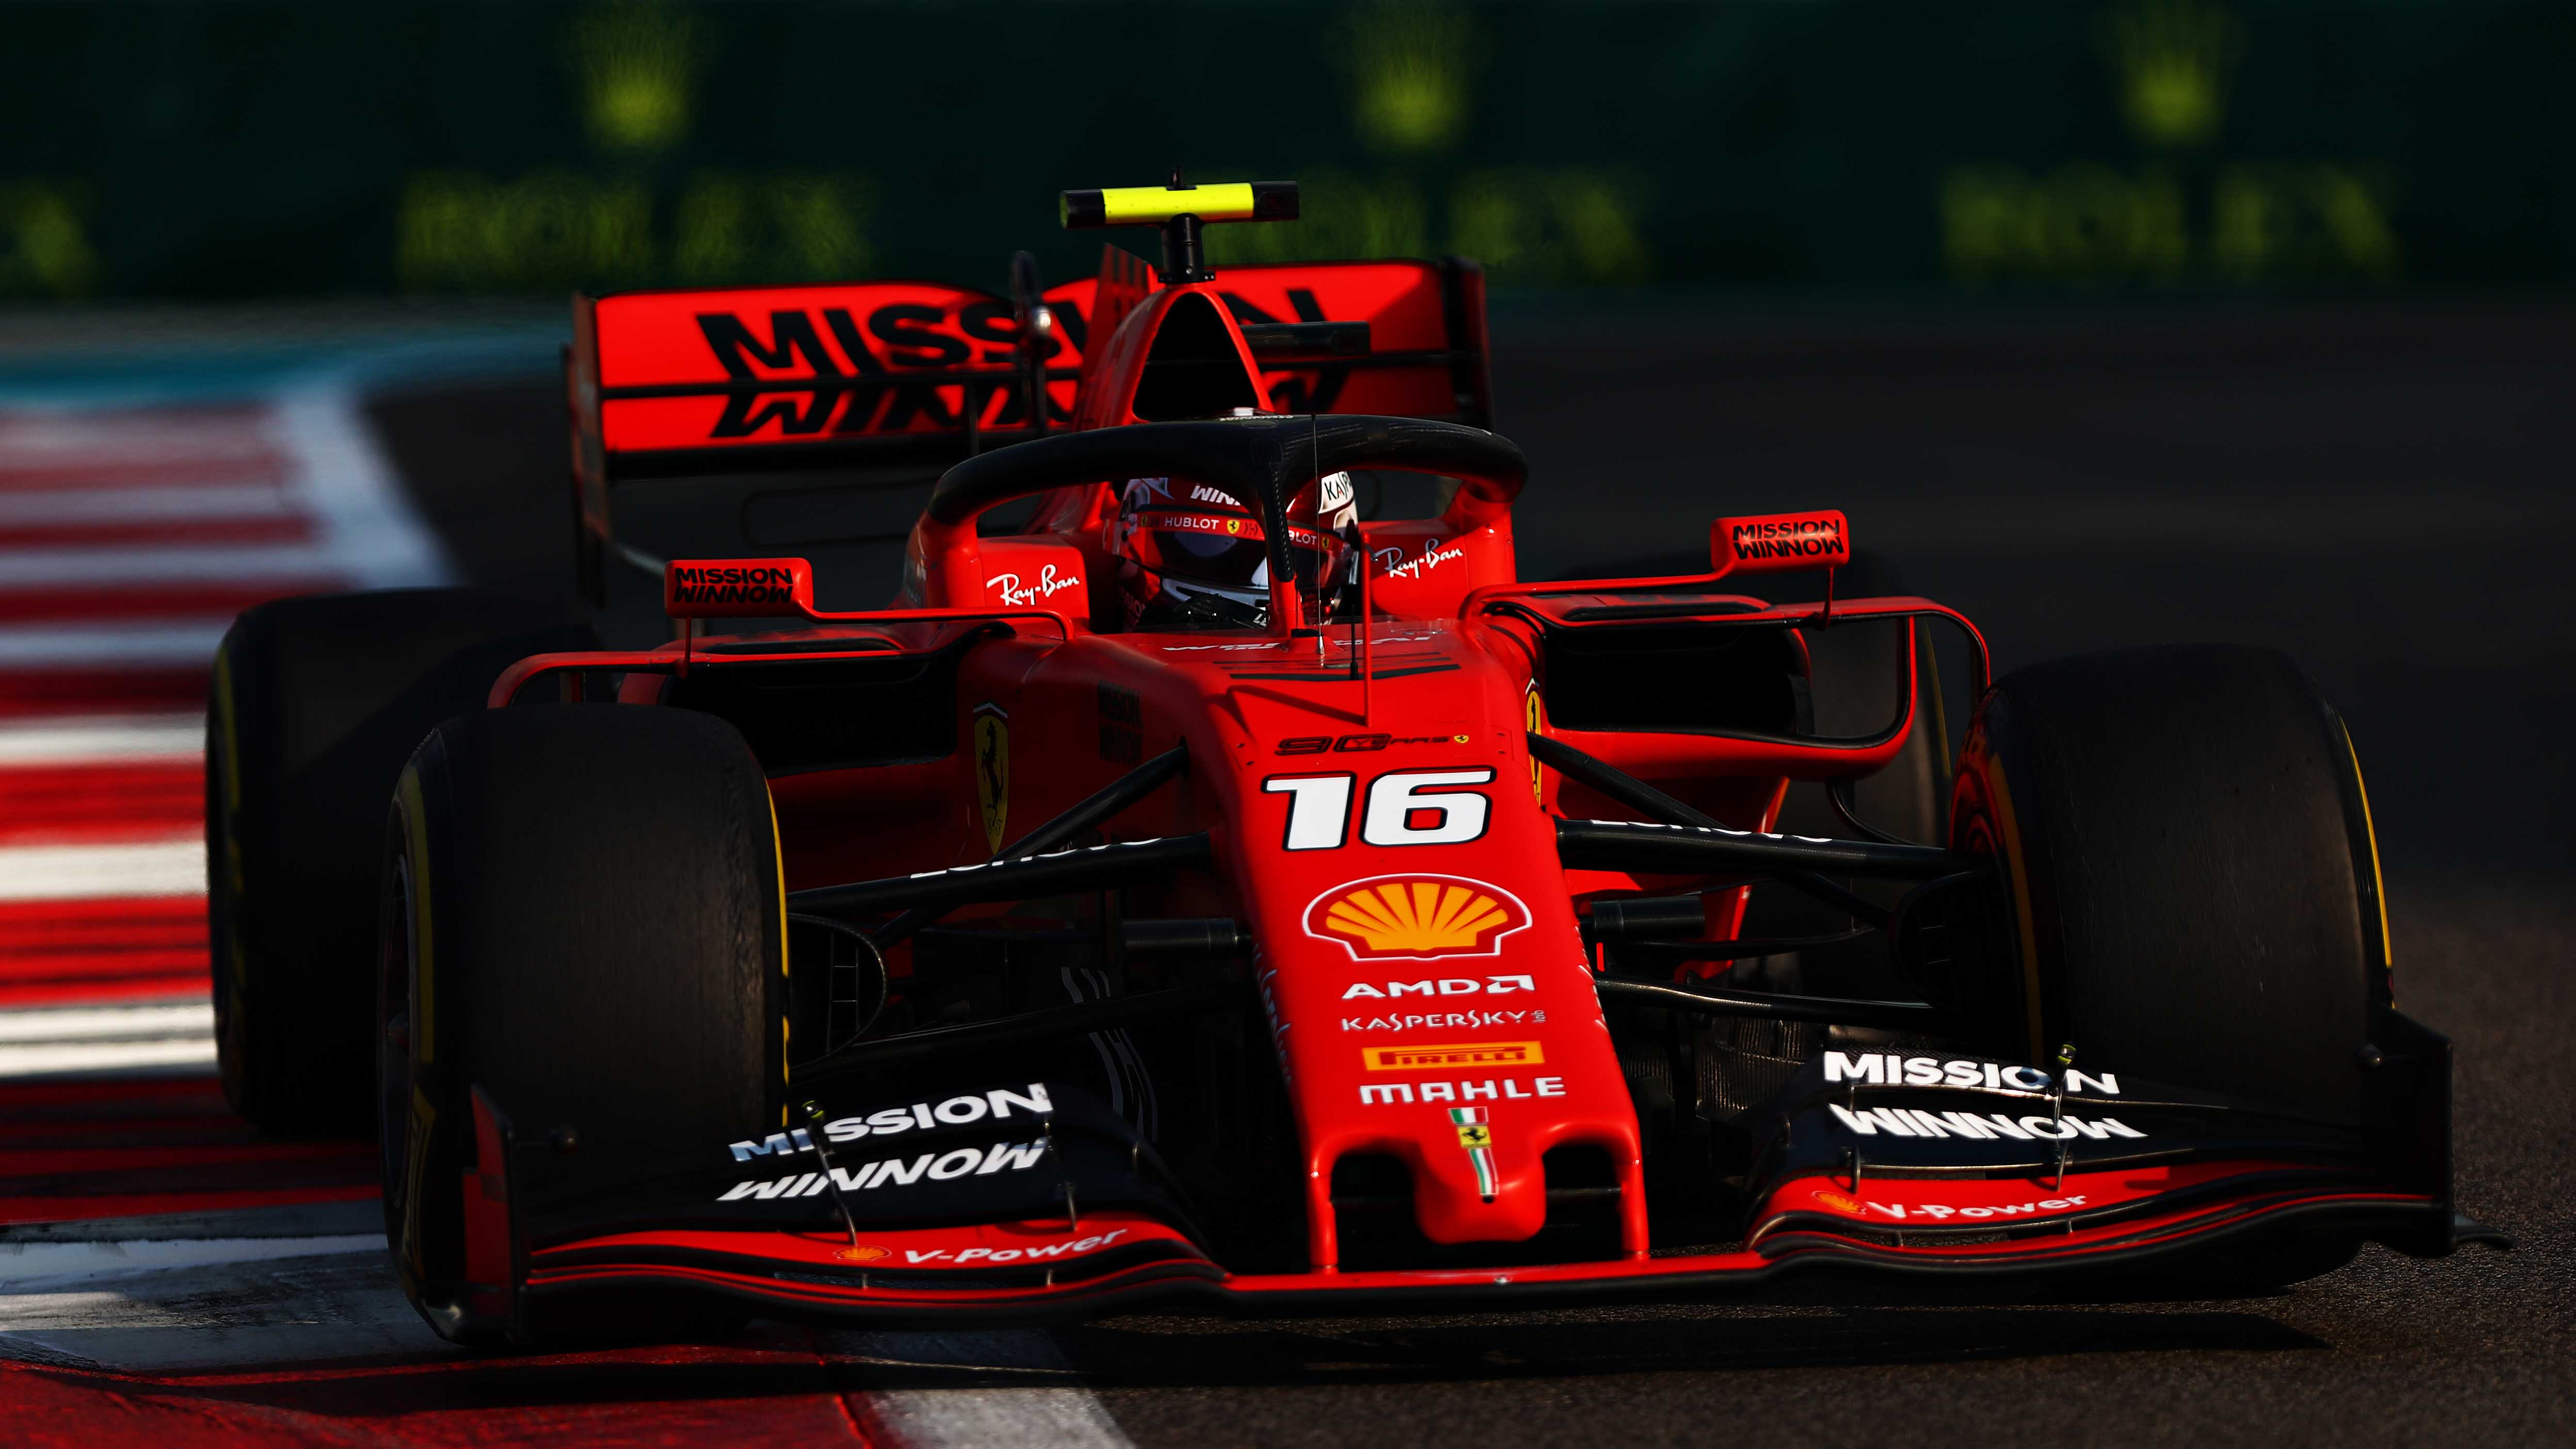 Ferrari S Leclerc Facing Post Race Investigation In Abu Dhabi Formula 1